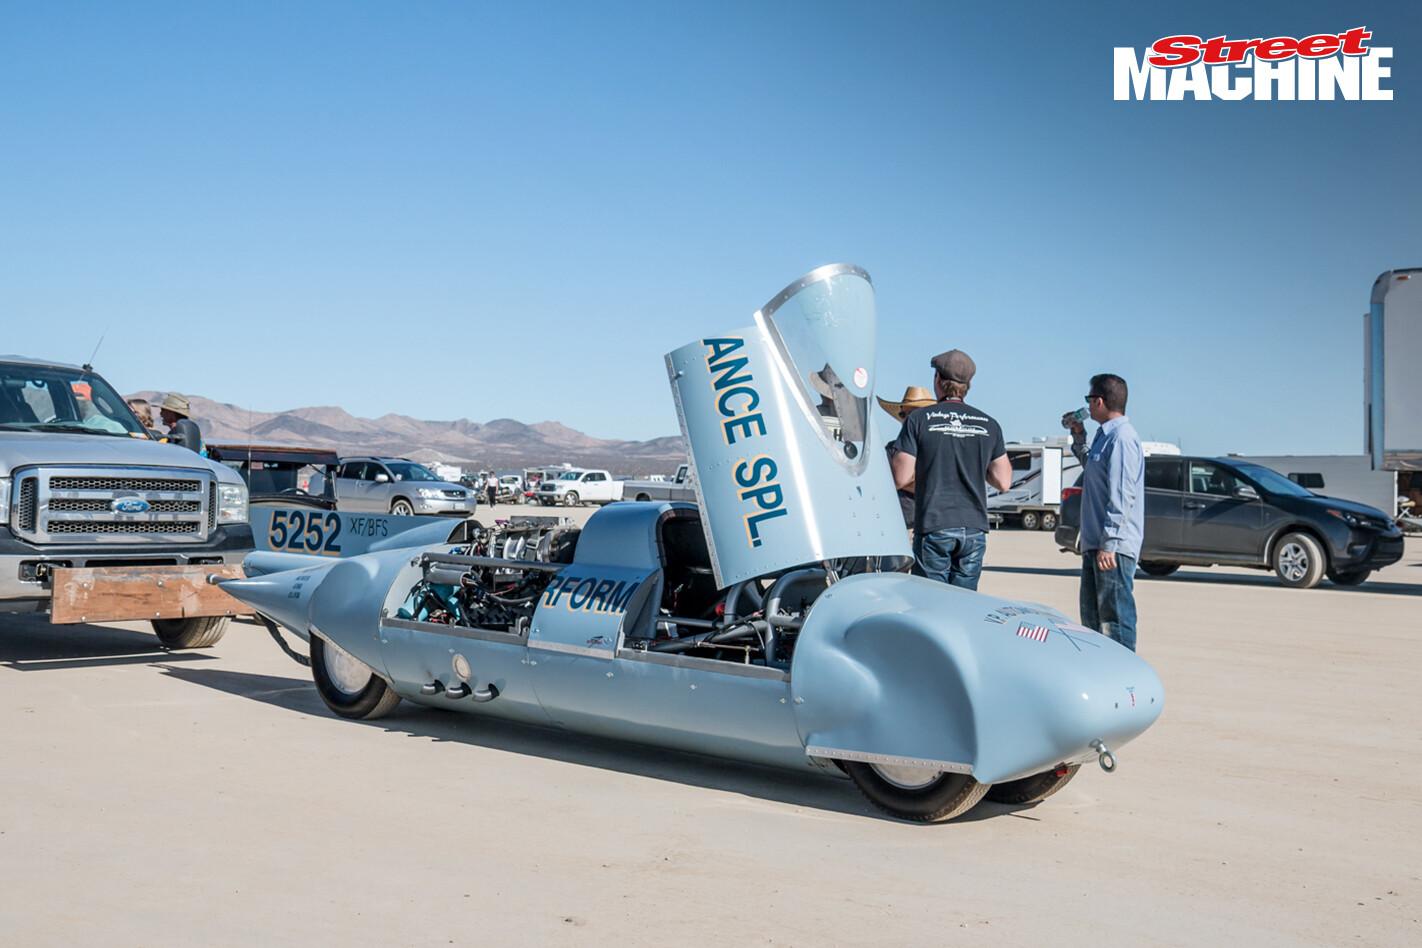 El Mirage Land Speed Racing 4153